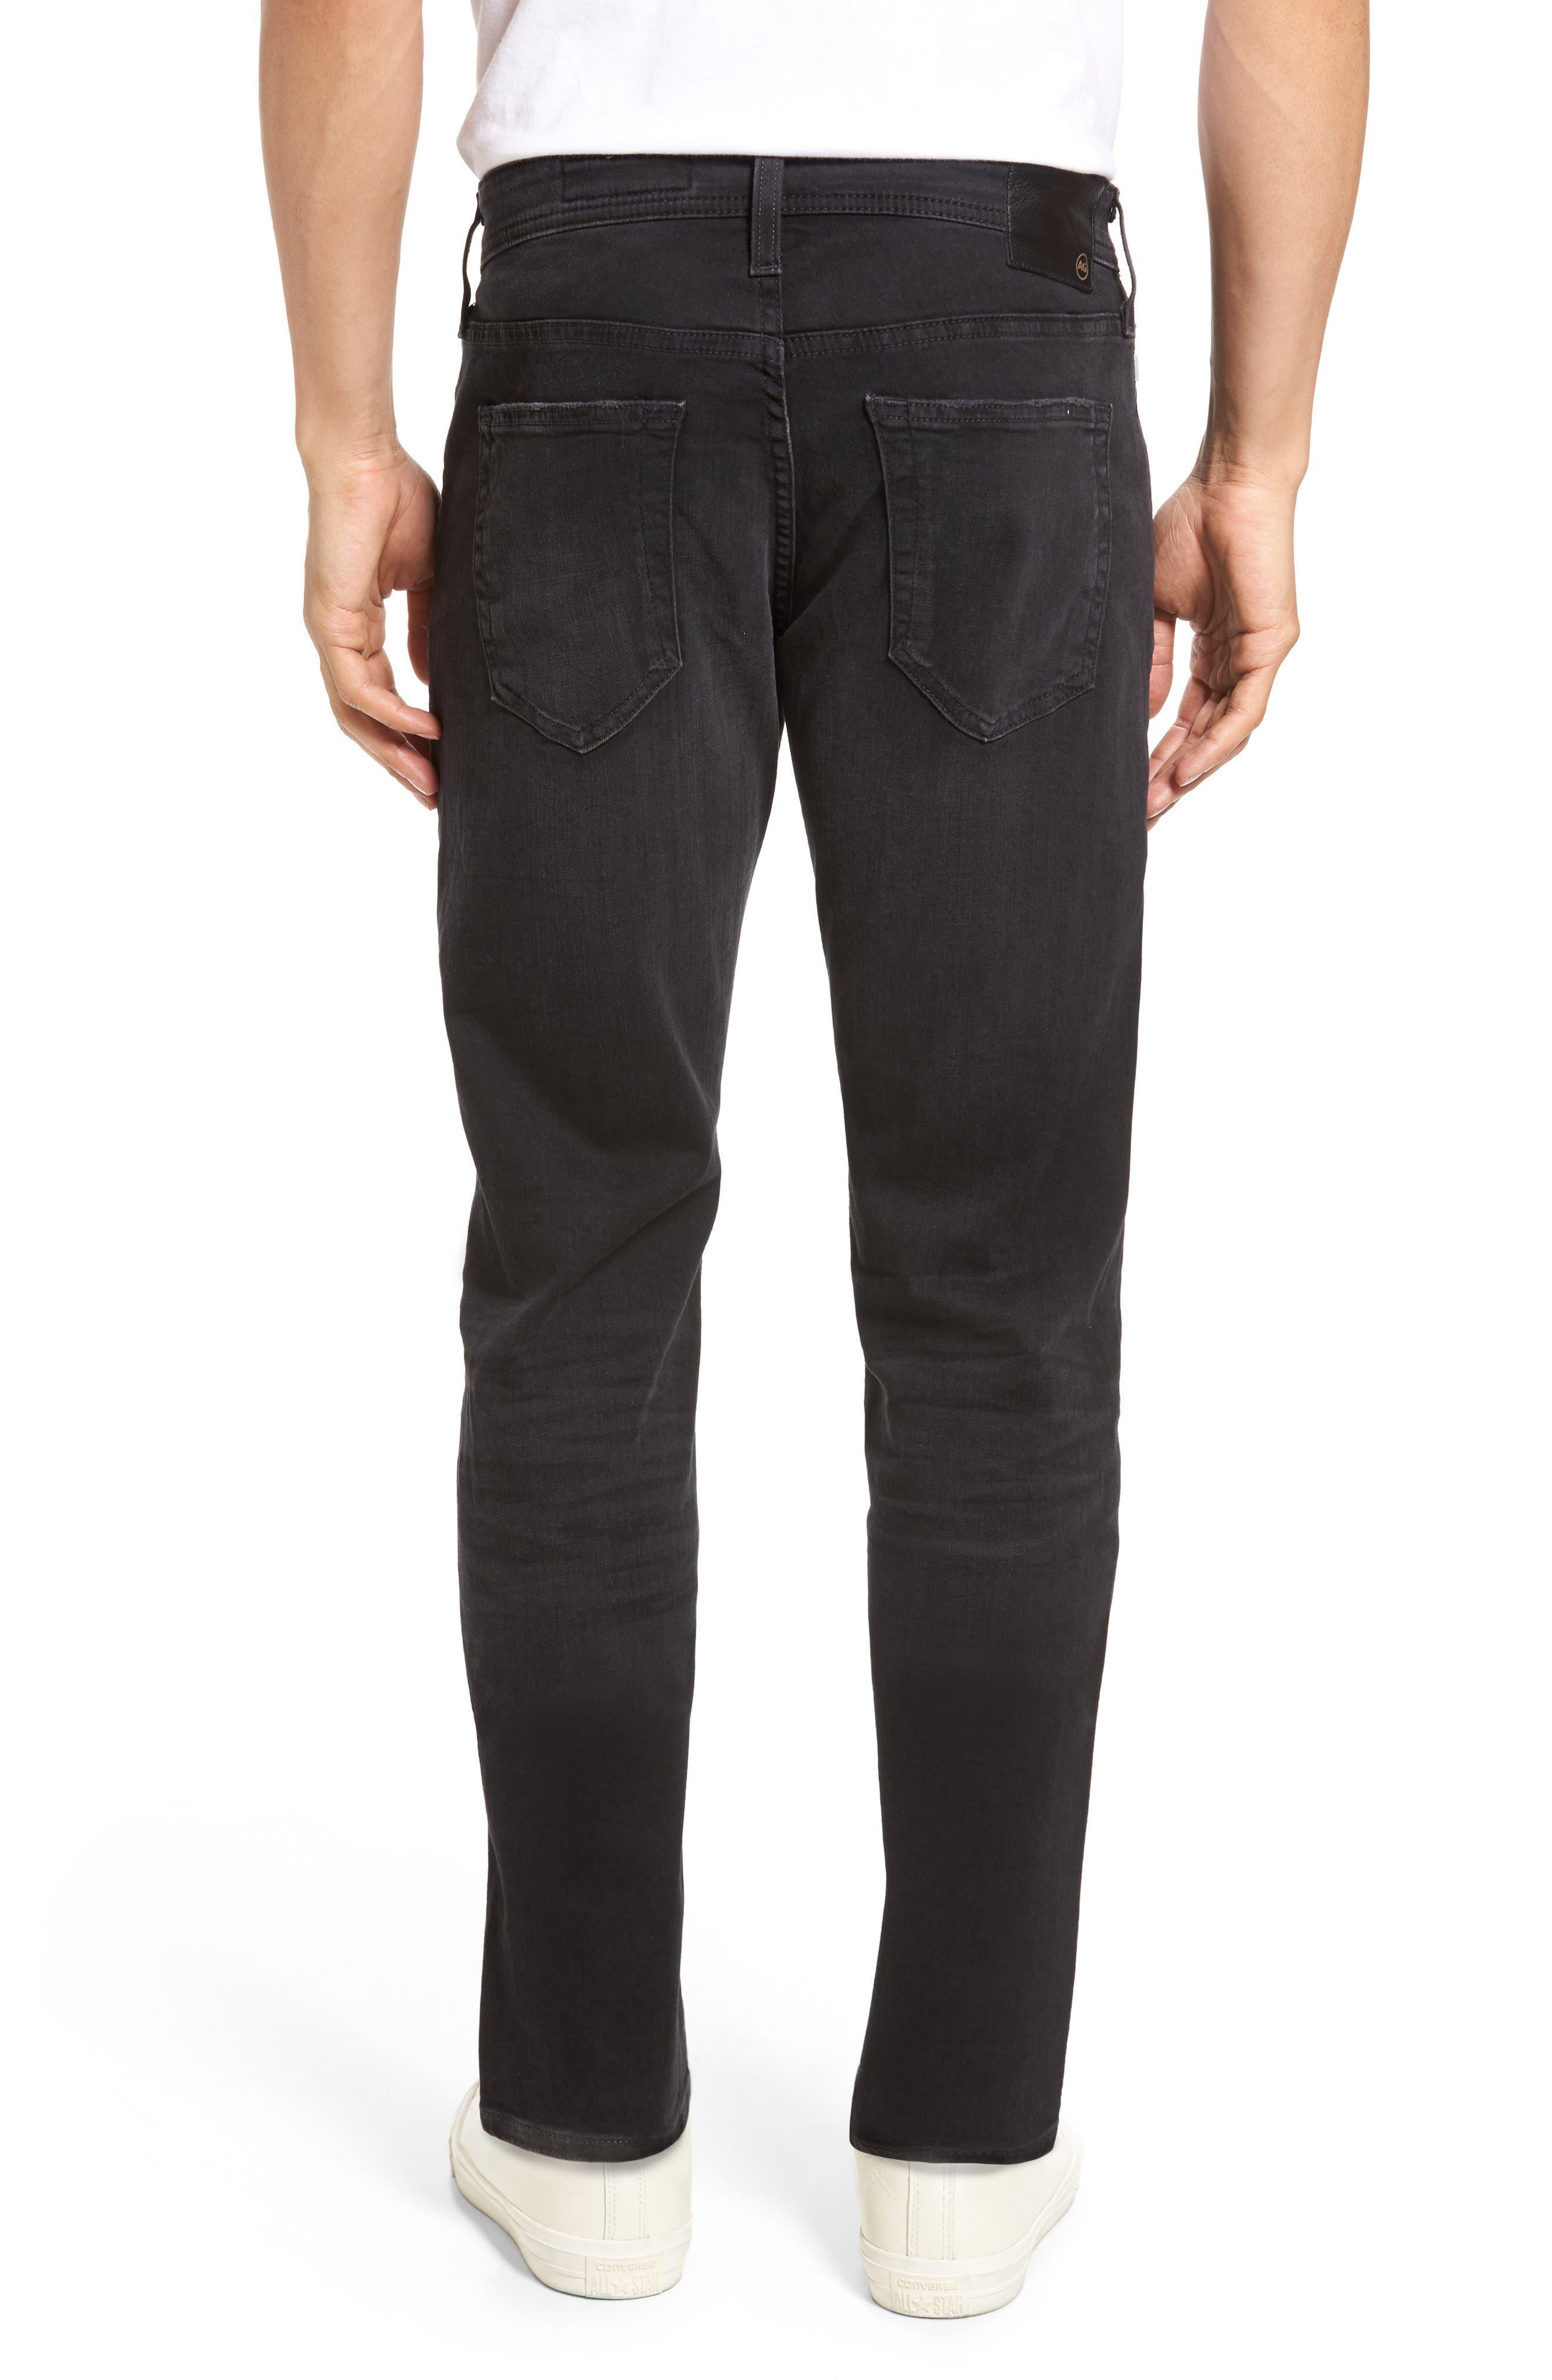 Tellis Slim Fit Jeans,                             Alternate thumbnail 2, color,                             3 Years Cinema